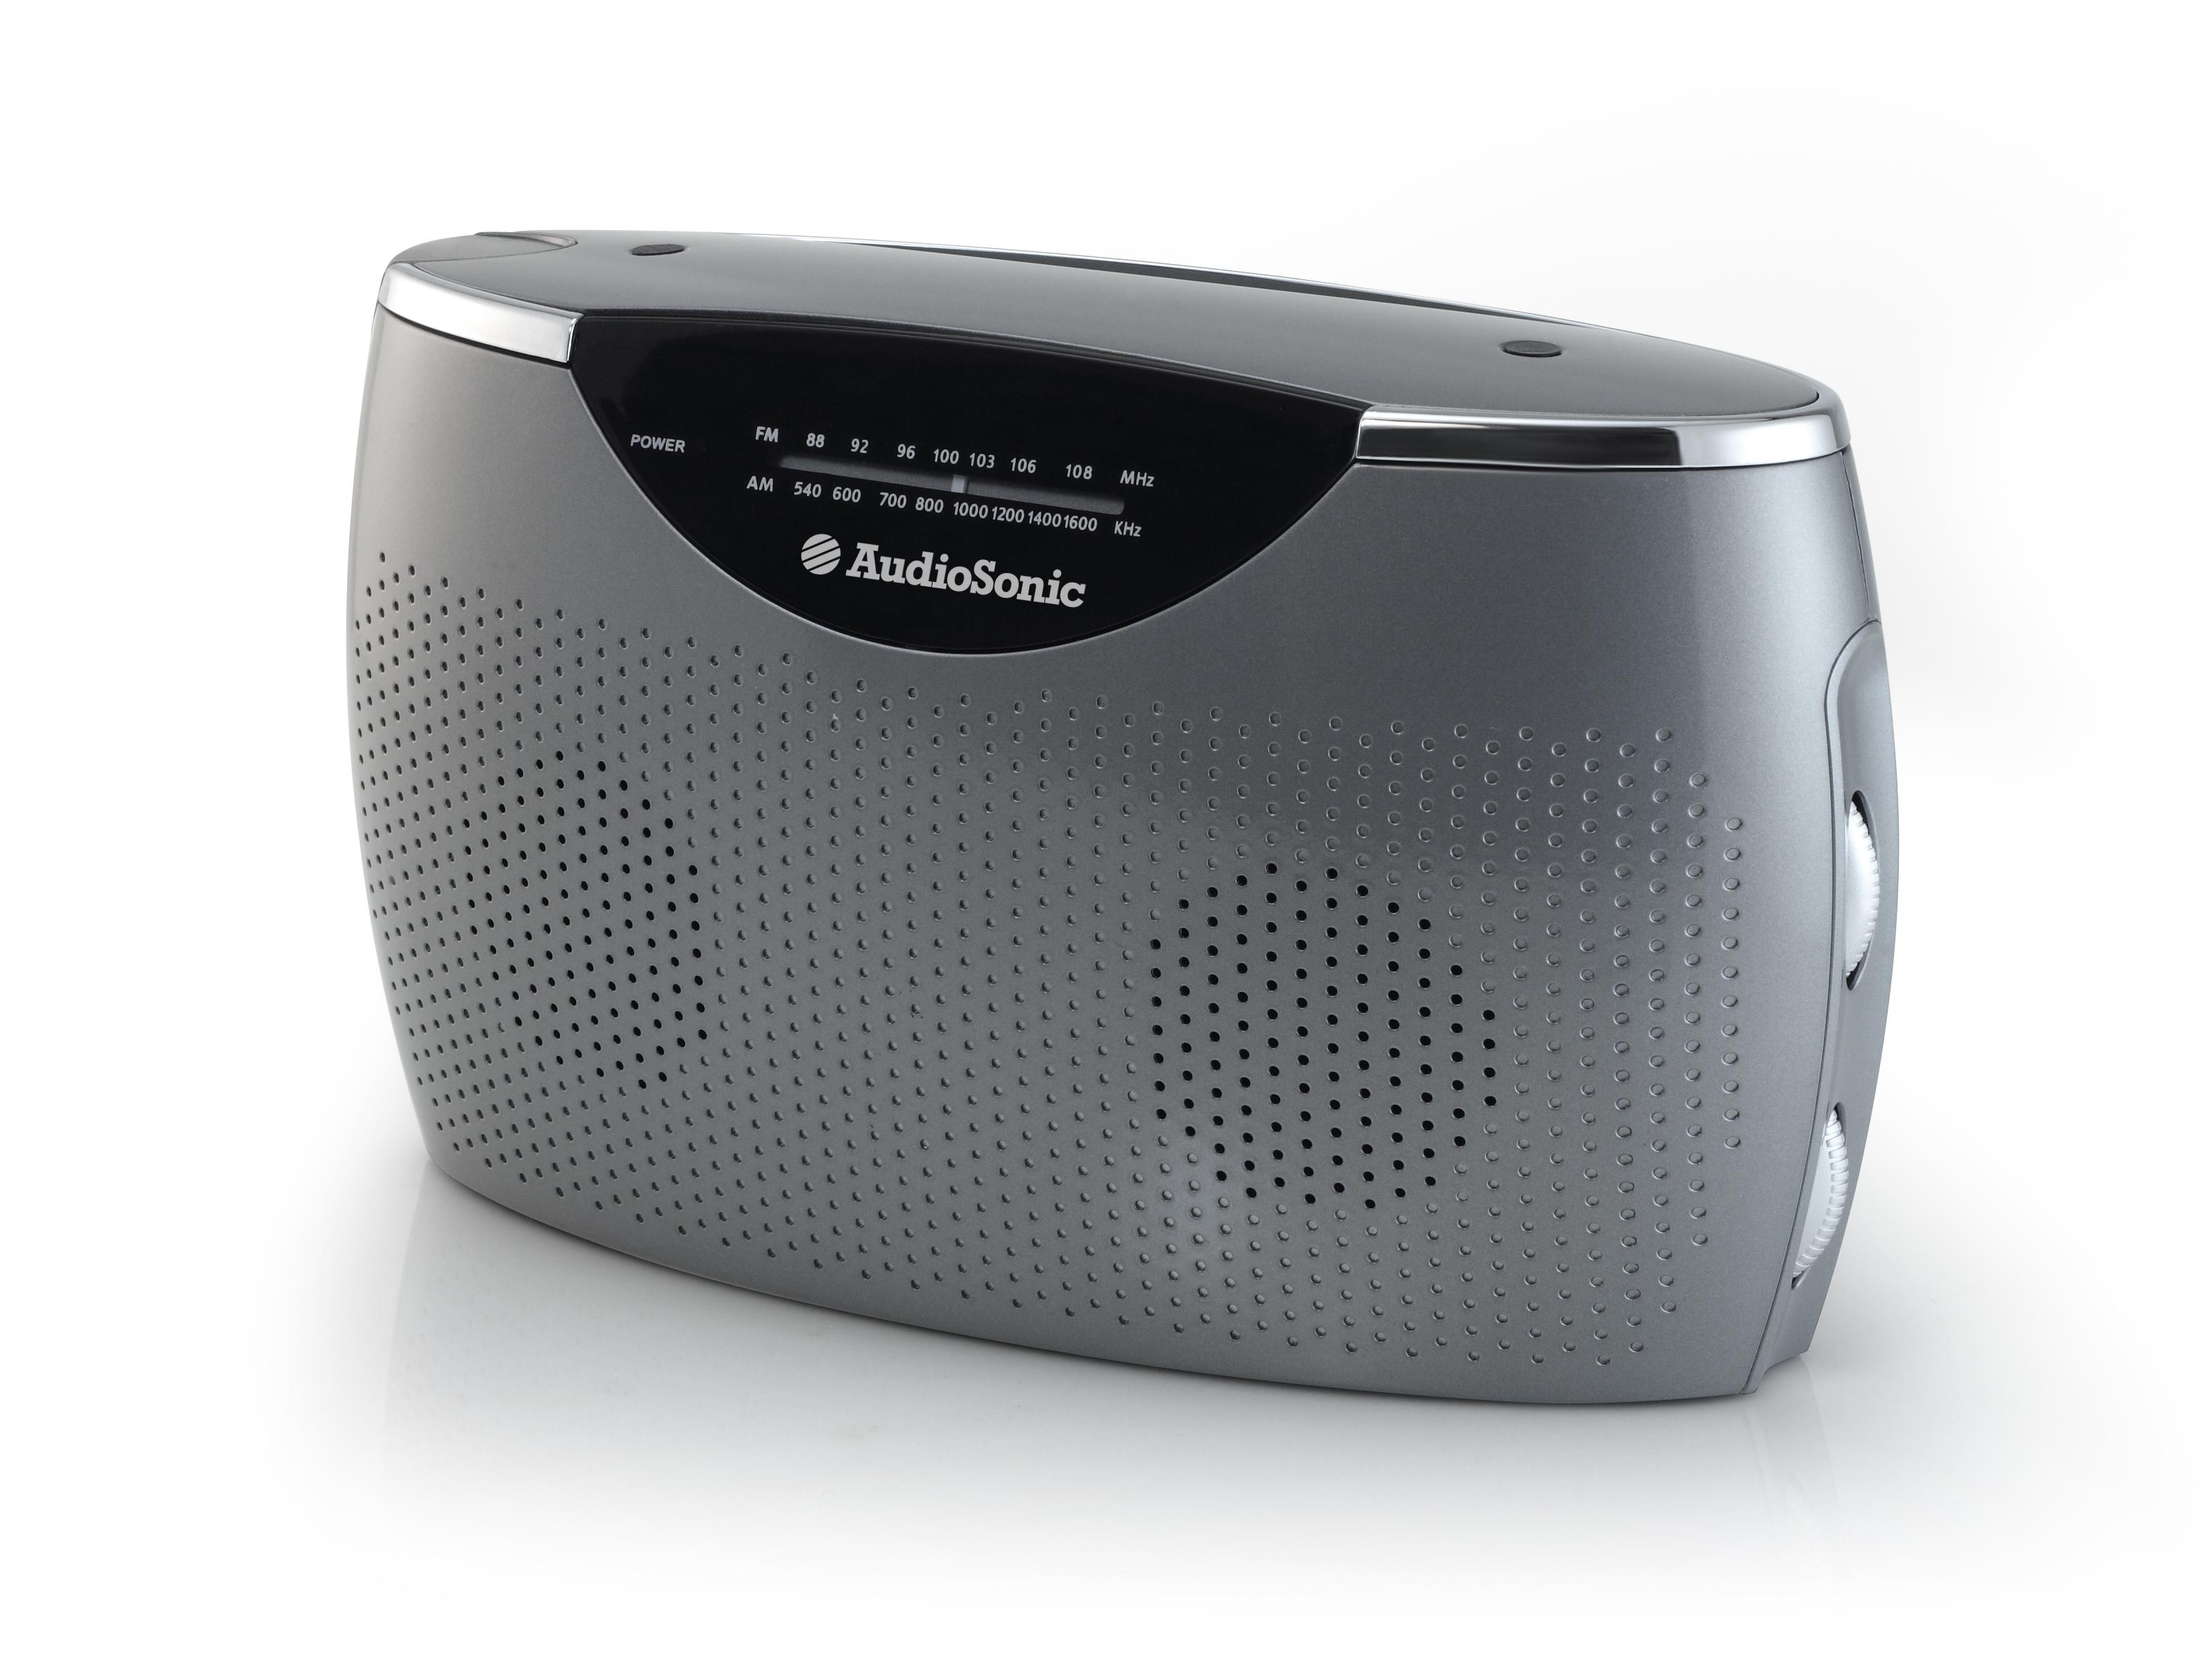 AudioSonic RD-1545 Portatile Analogico Grigio, Argento radio